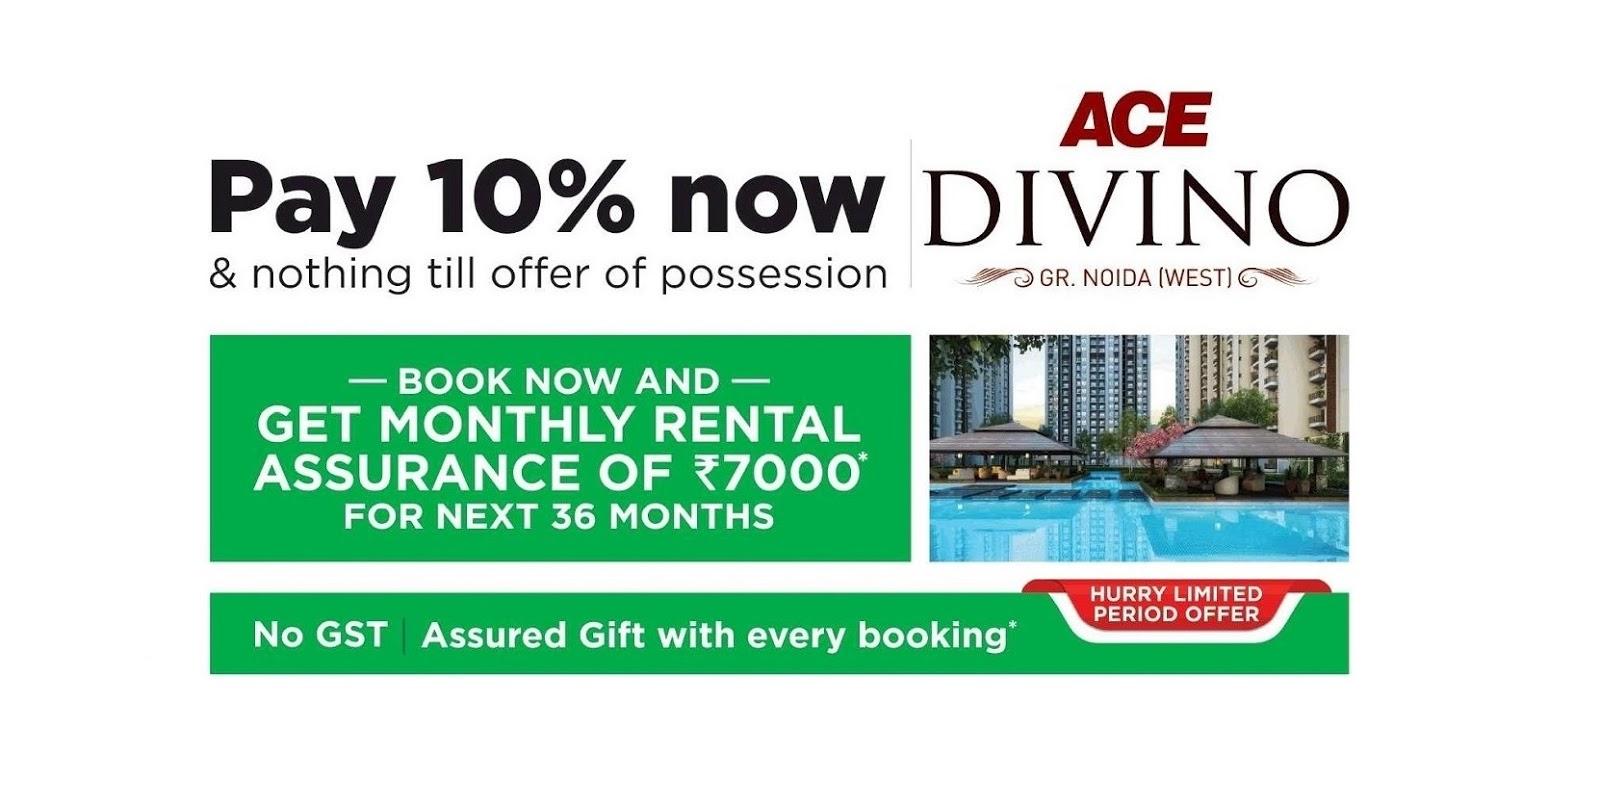 Ace Divino - Offer